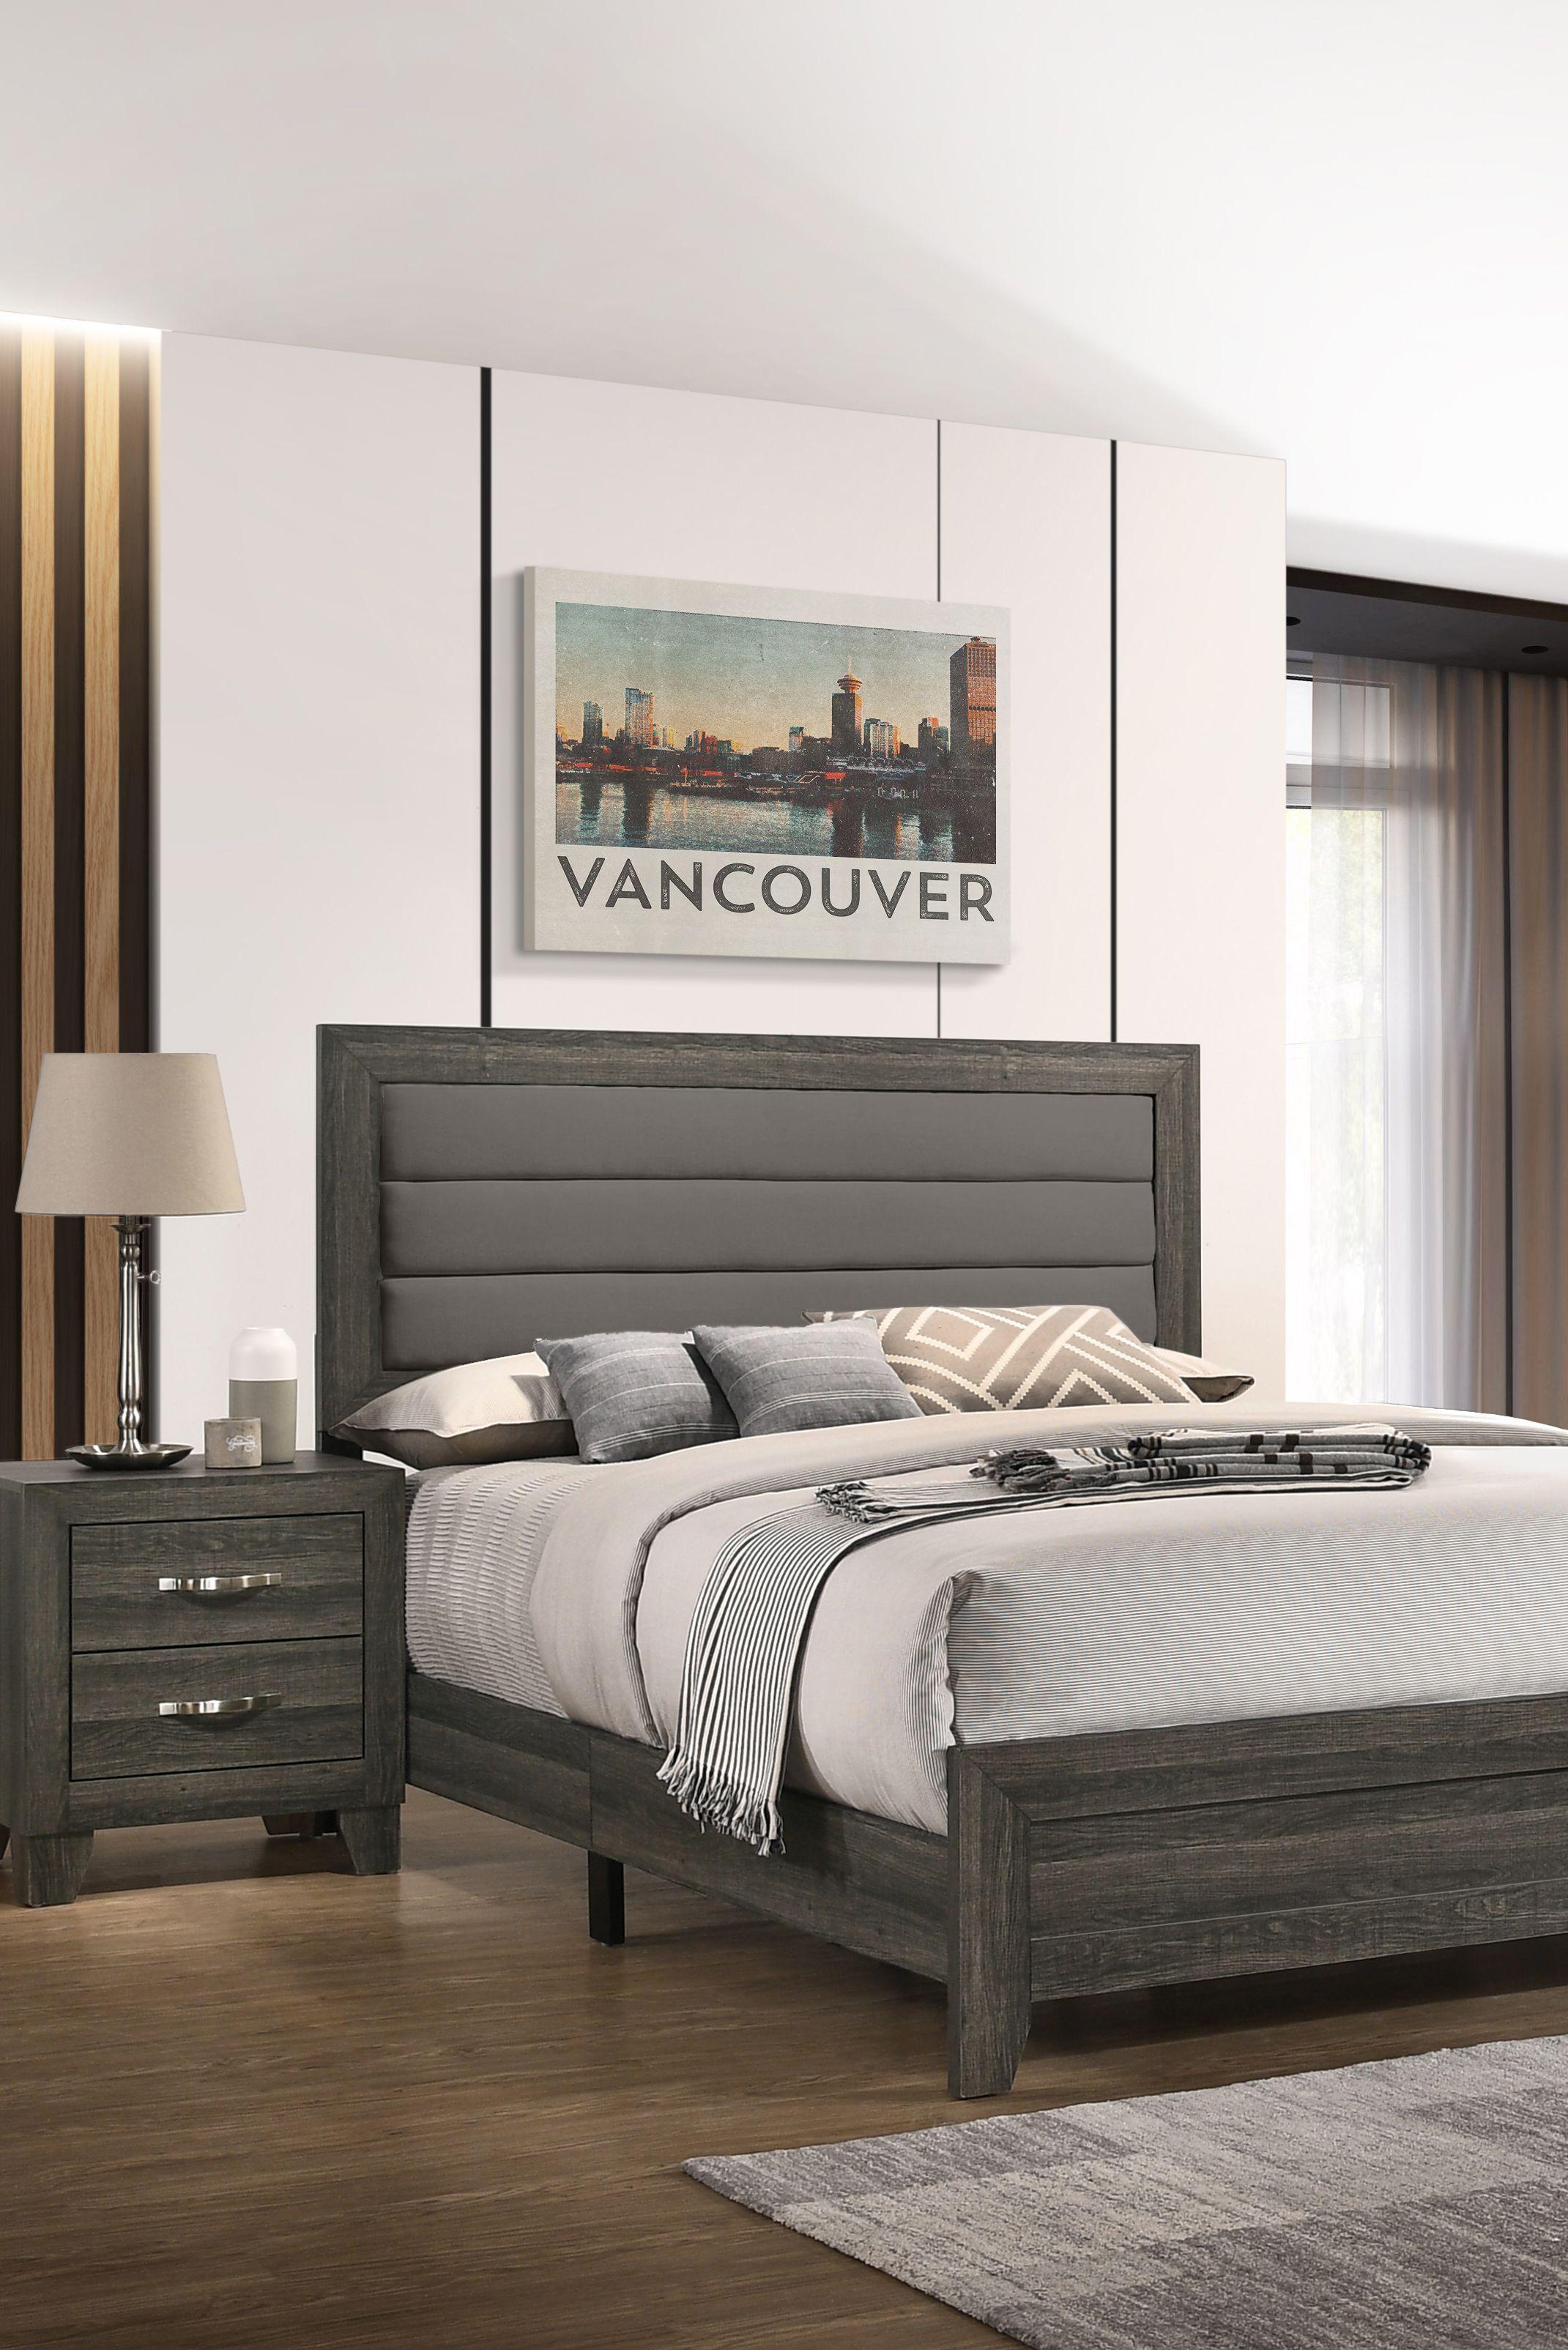 The modernstyled Darby 4 piece Queen Bedroom Set is 396